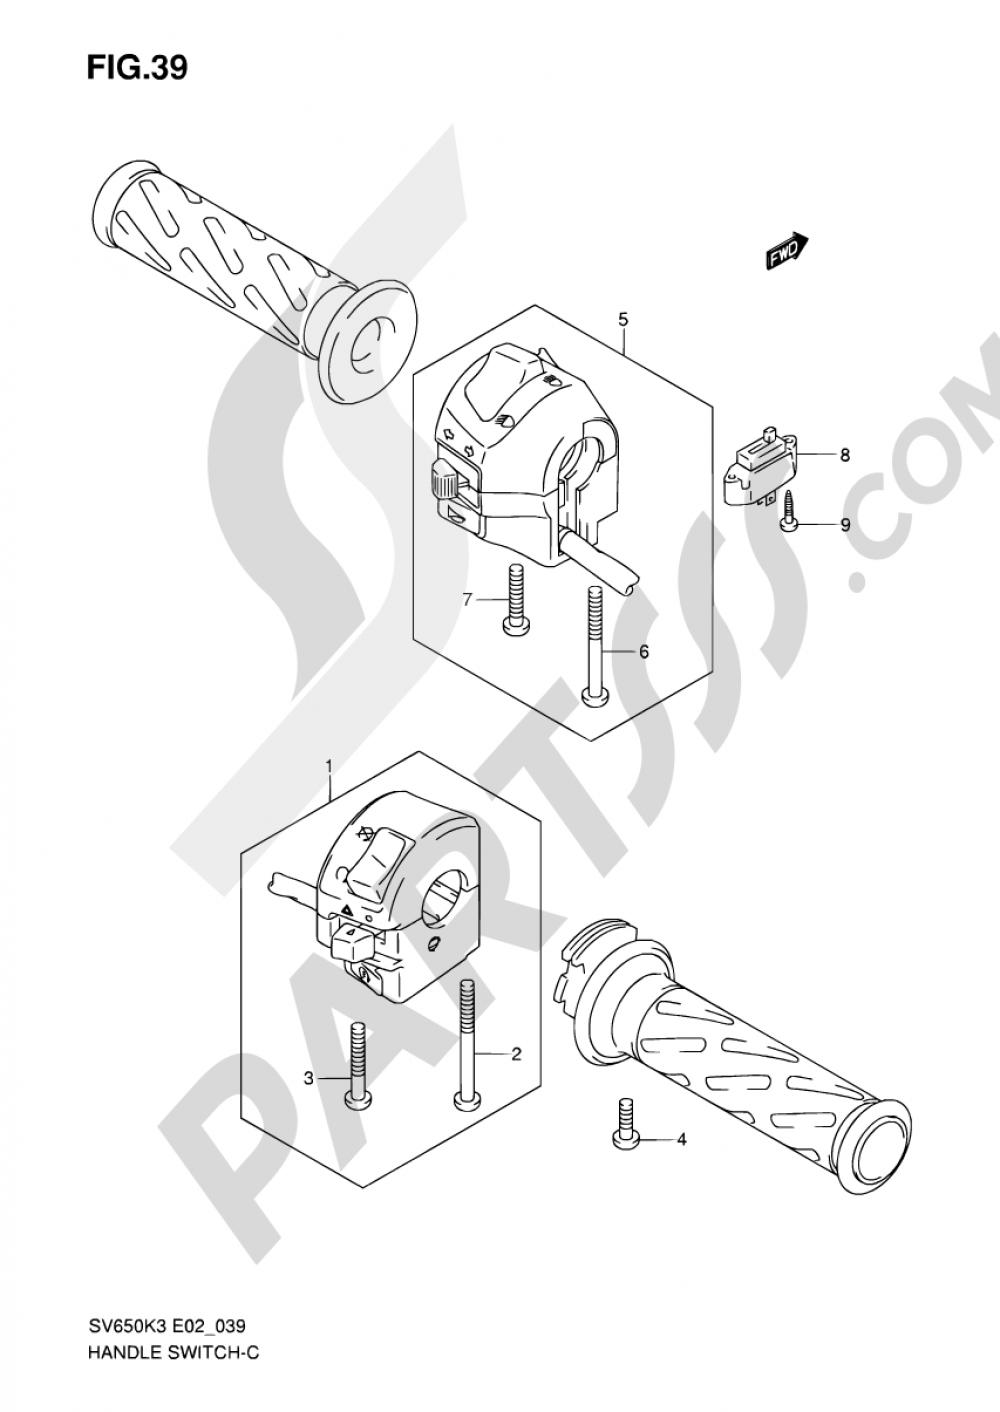 39 - HANDLE SWITCH (SV650K3/K4/K5/K6/K7/UK3/UK4/UK5/UK6/UK7/UAK7) Suzuki  SV650 2003